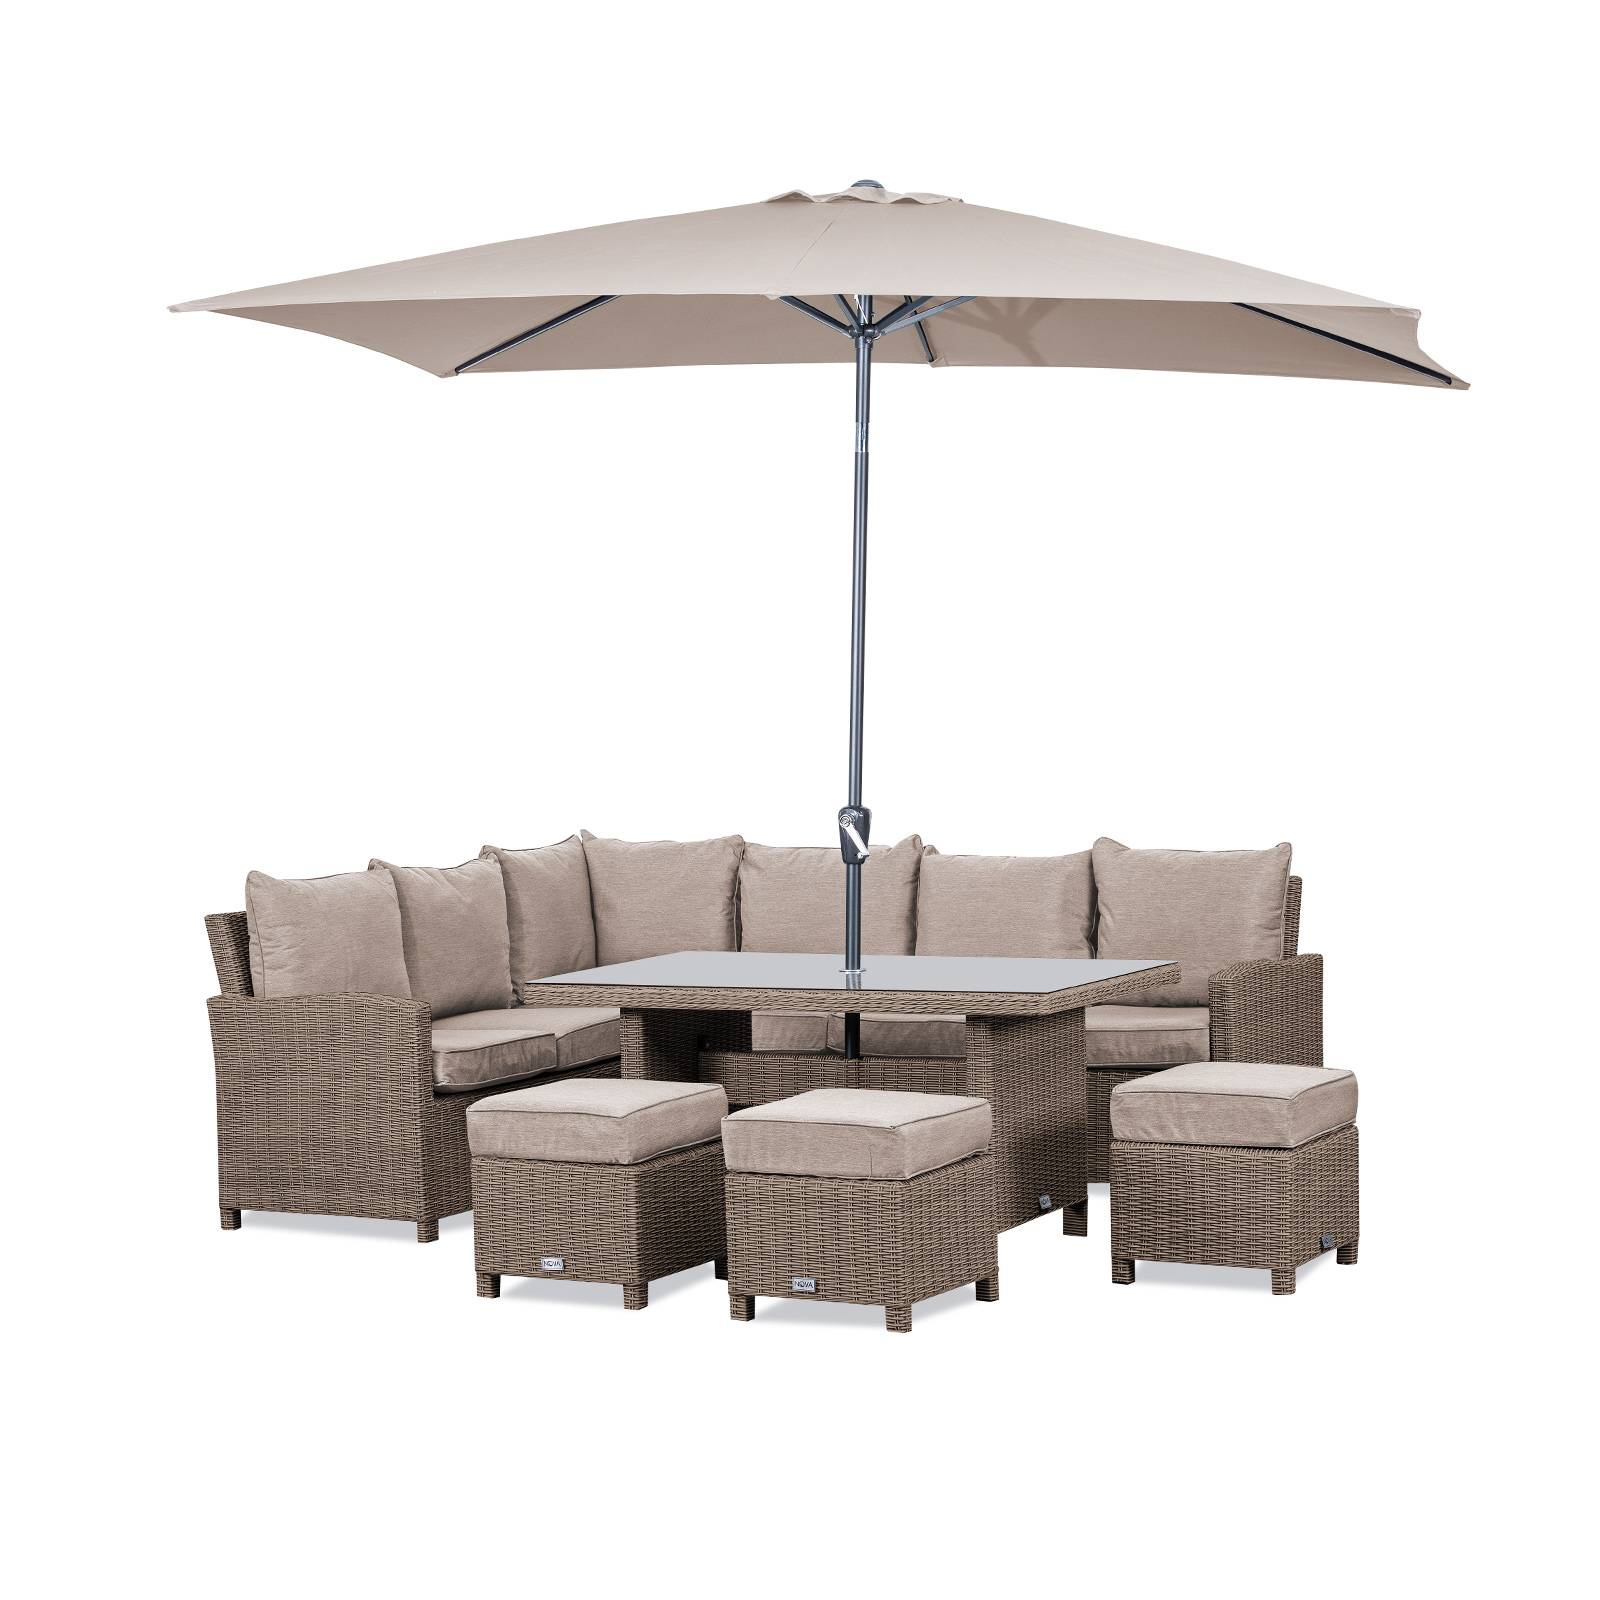 Oakworld Alfresco Heritage Ciara Corner Dining Set with Parasol Hole Table   Left Hand   Willow